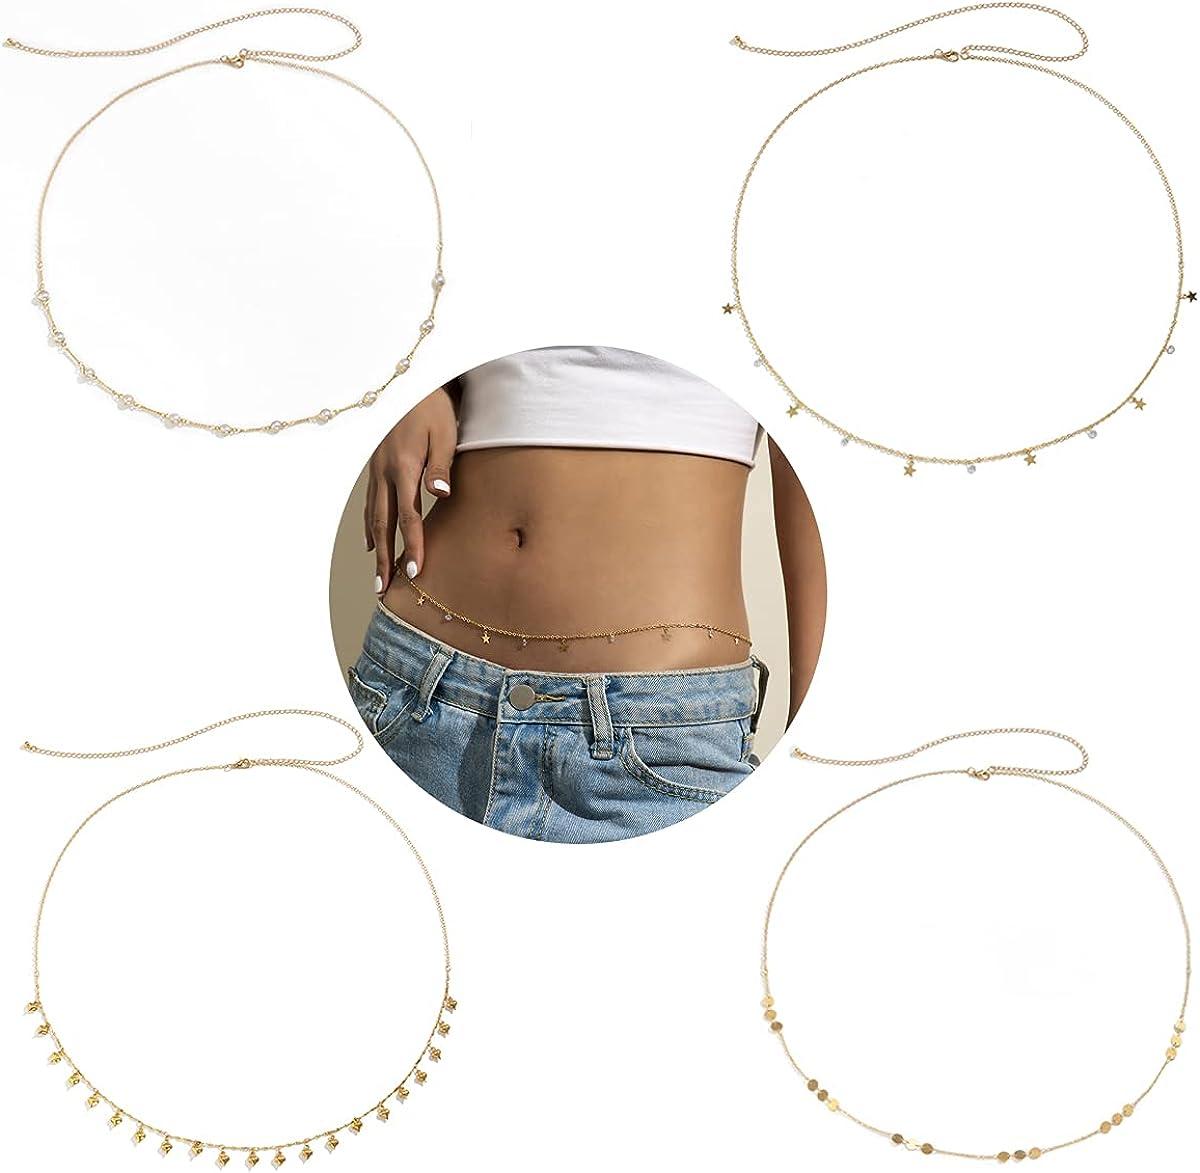 4Pcs Sexy Summer Belly Chain Dainty Beads Sequins Waist Chain for Women Girls Charm Beach Bikini Body Chain Jewelry Set